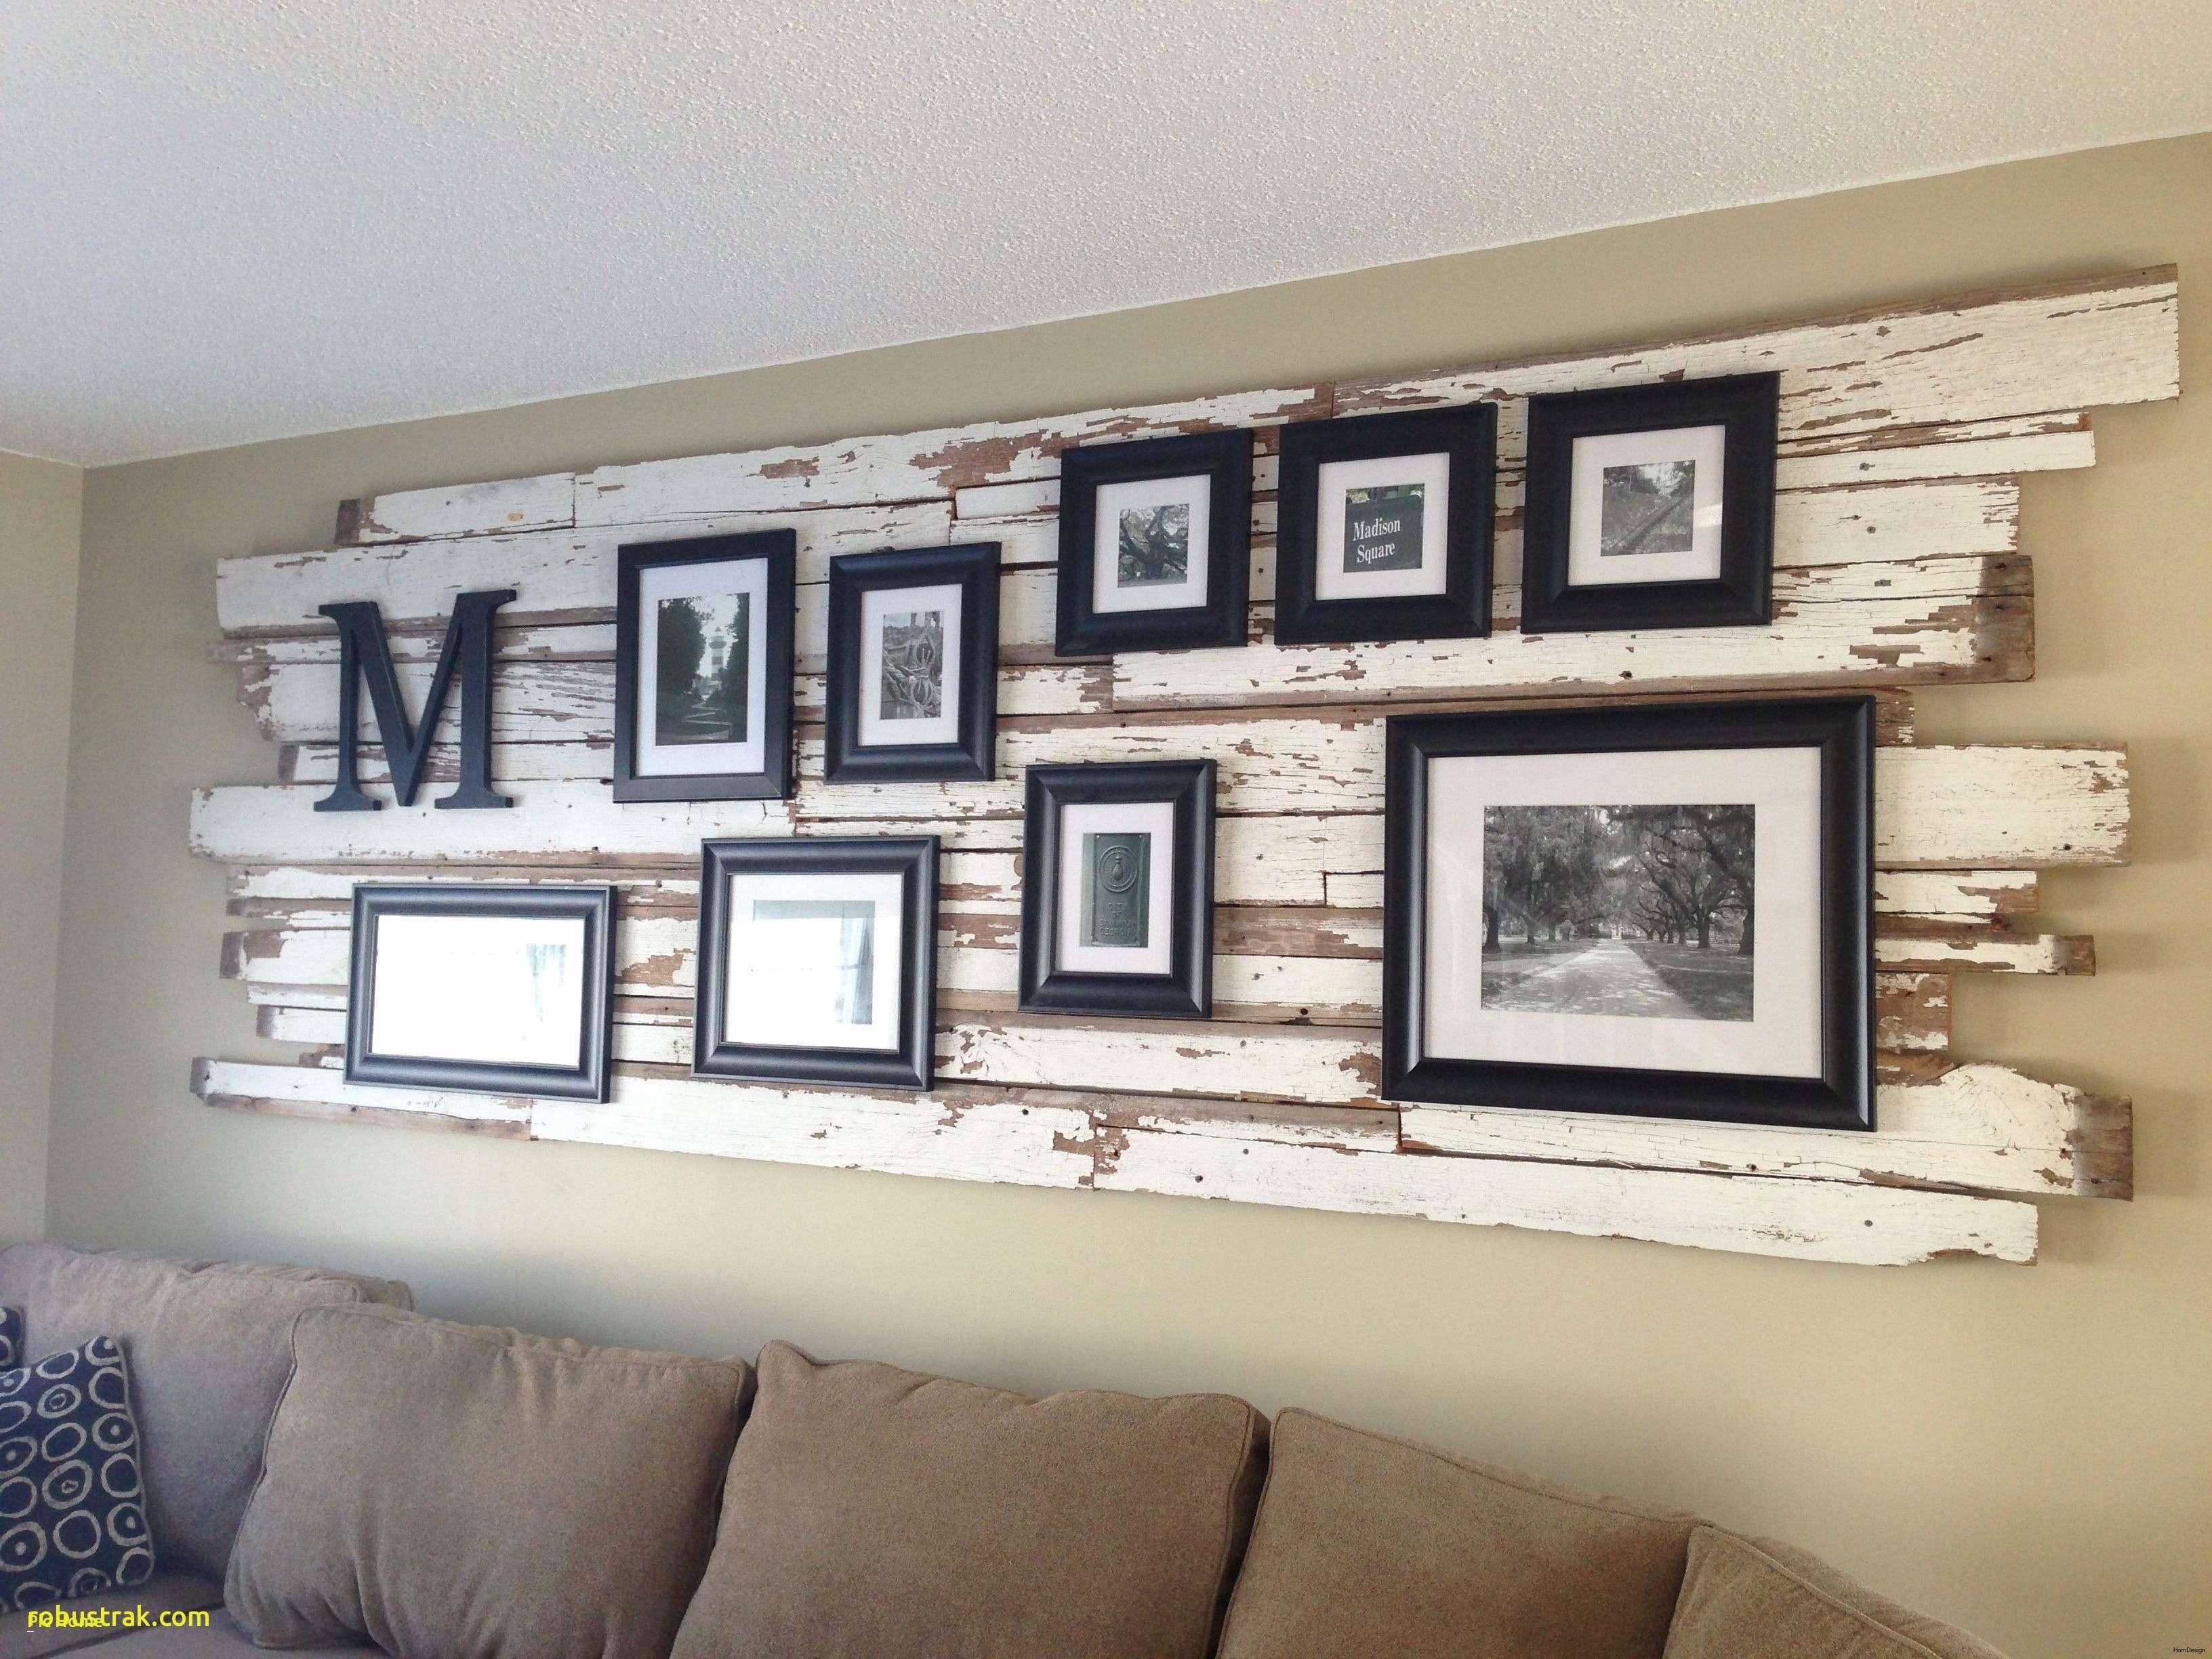 30 Cute Rustic Living Room Wall Decor Ideas Hallway Wall Decor Wall Decor Living Room Wall Art Living Room